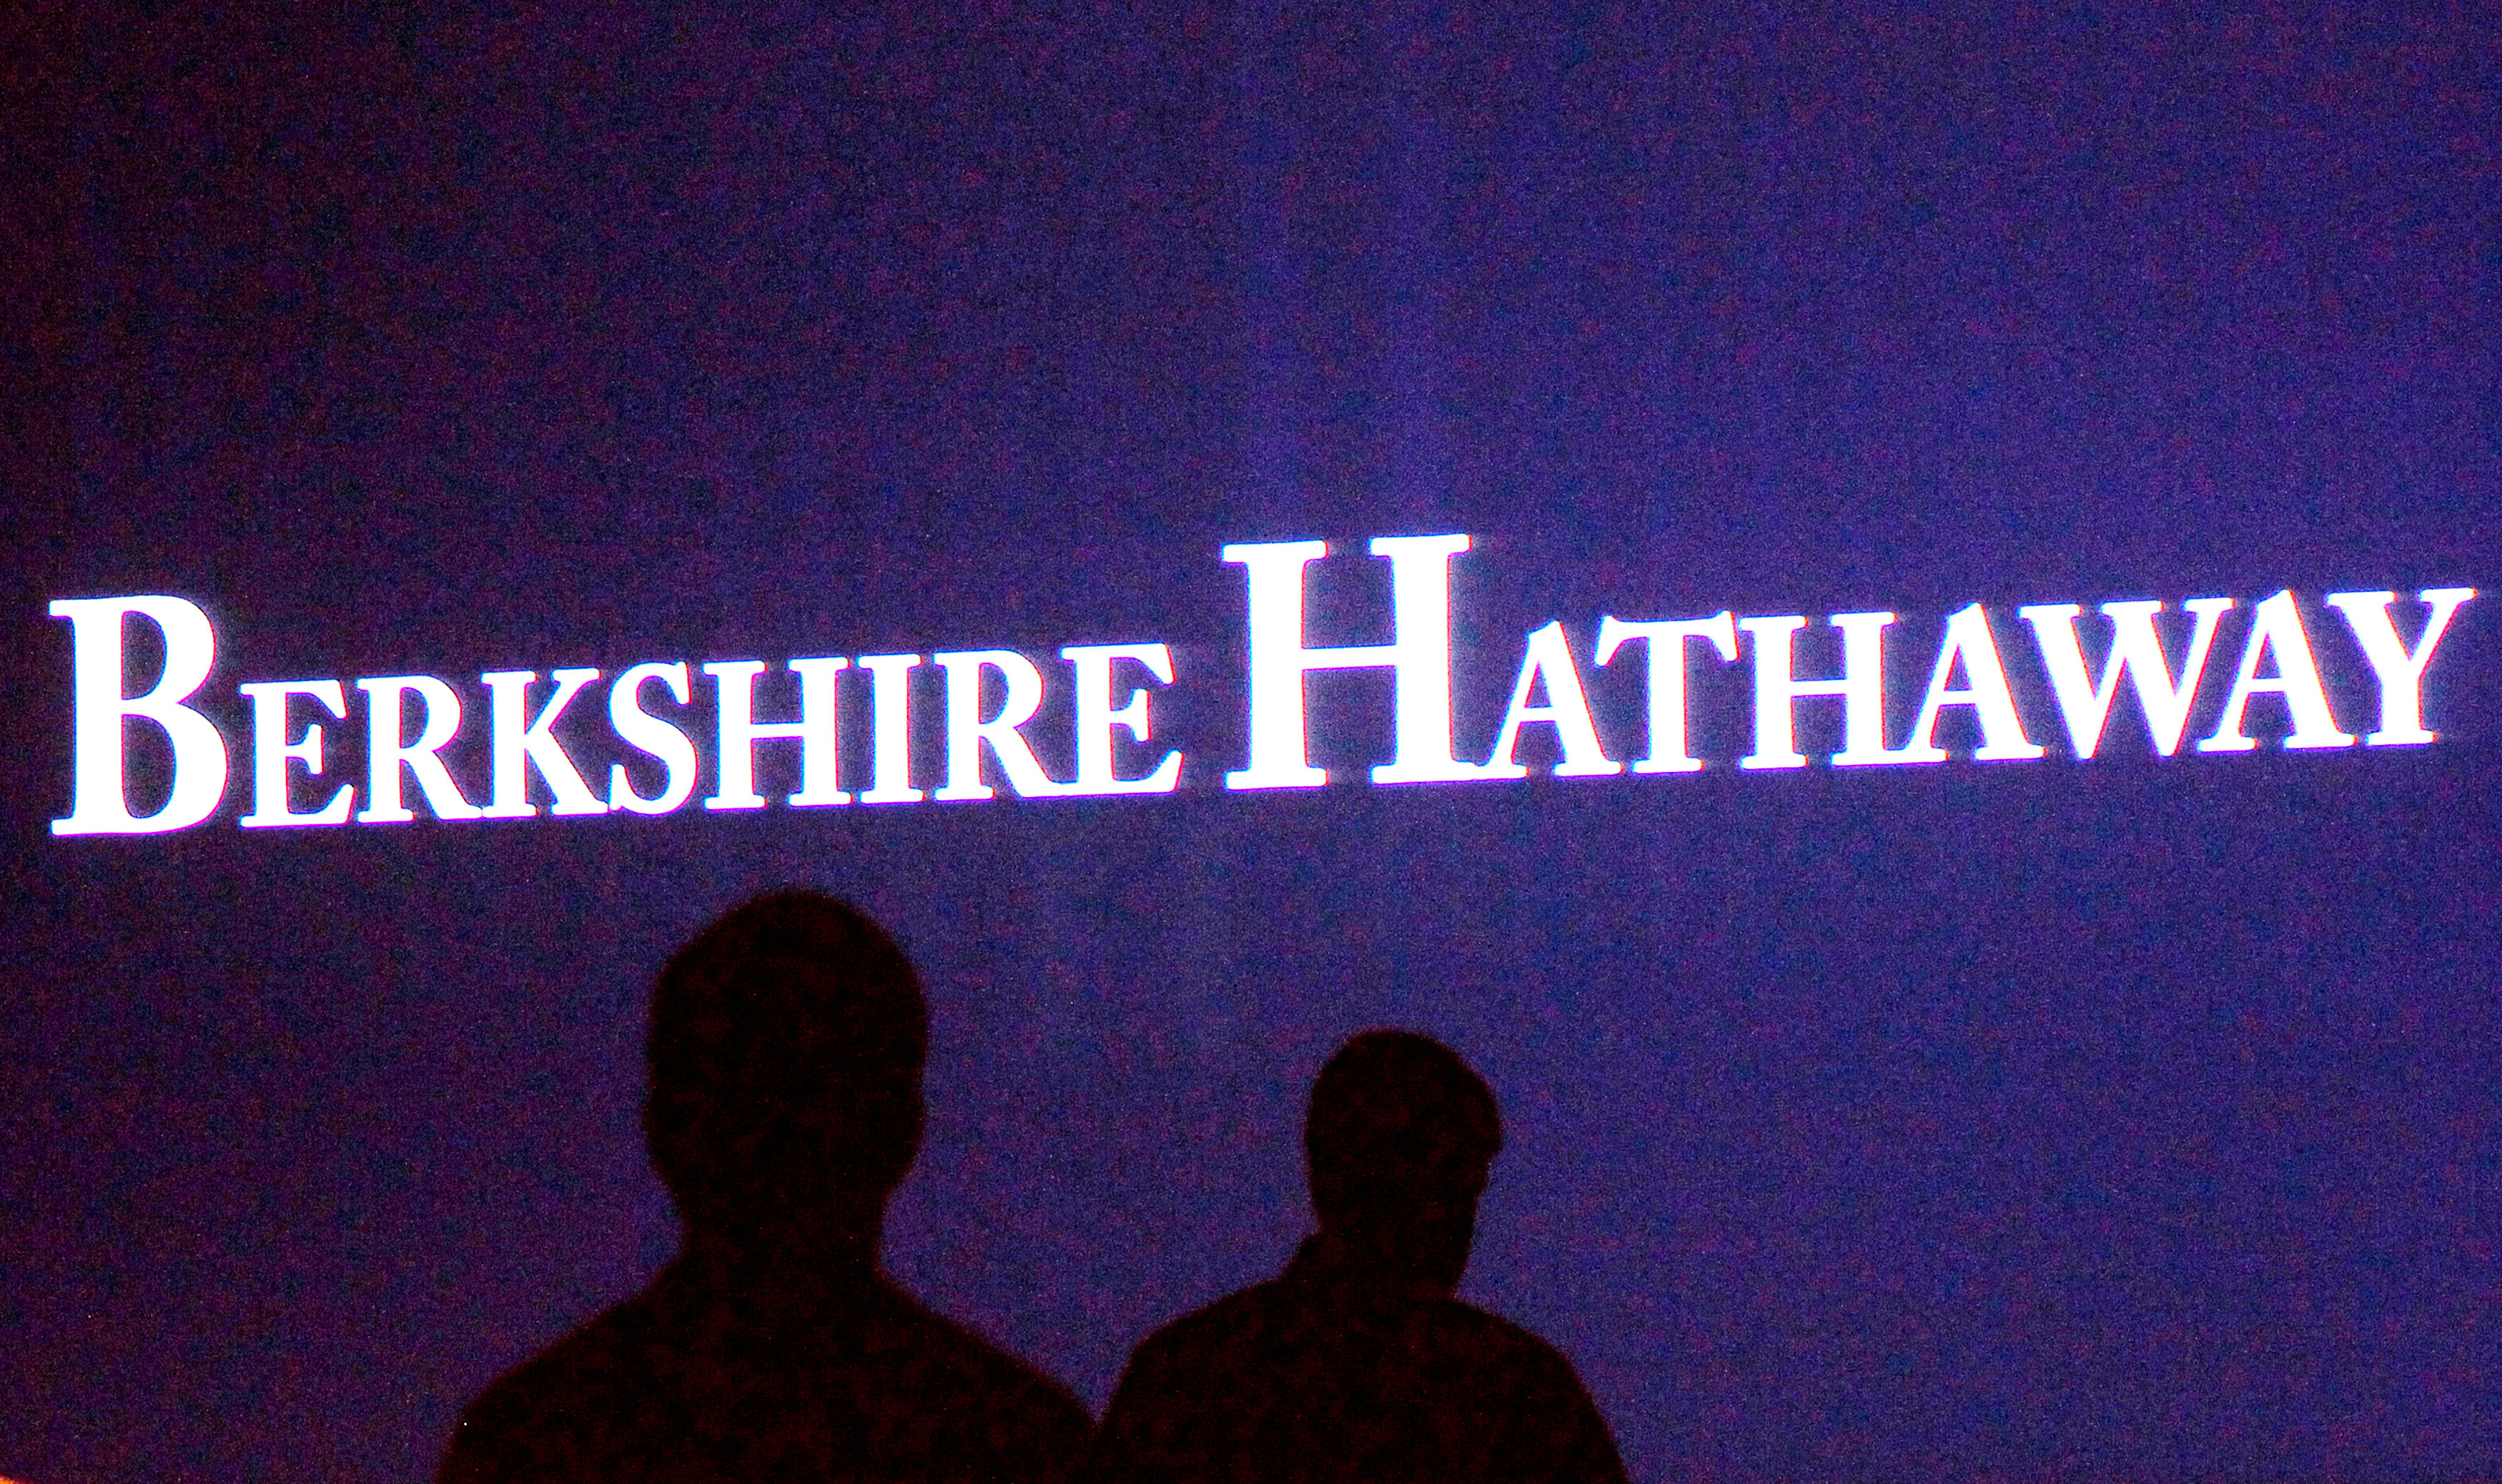 Berkshire Hathaway profit surges